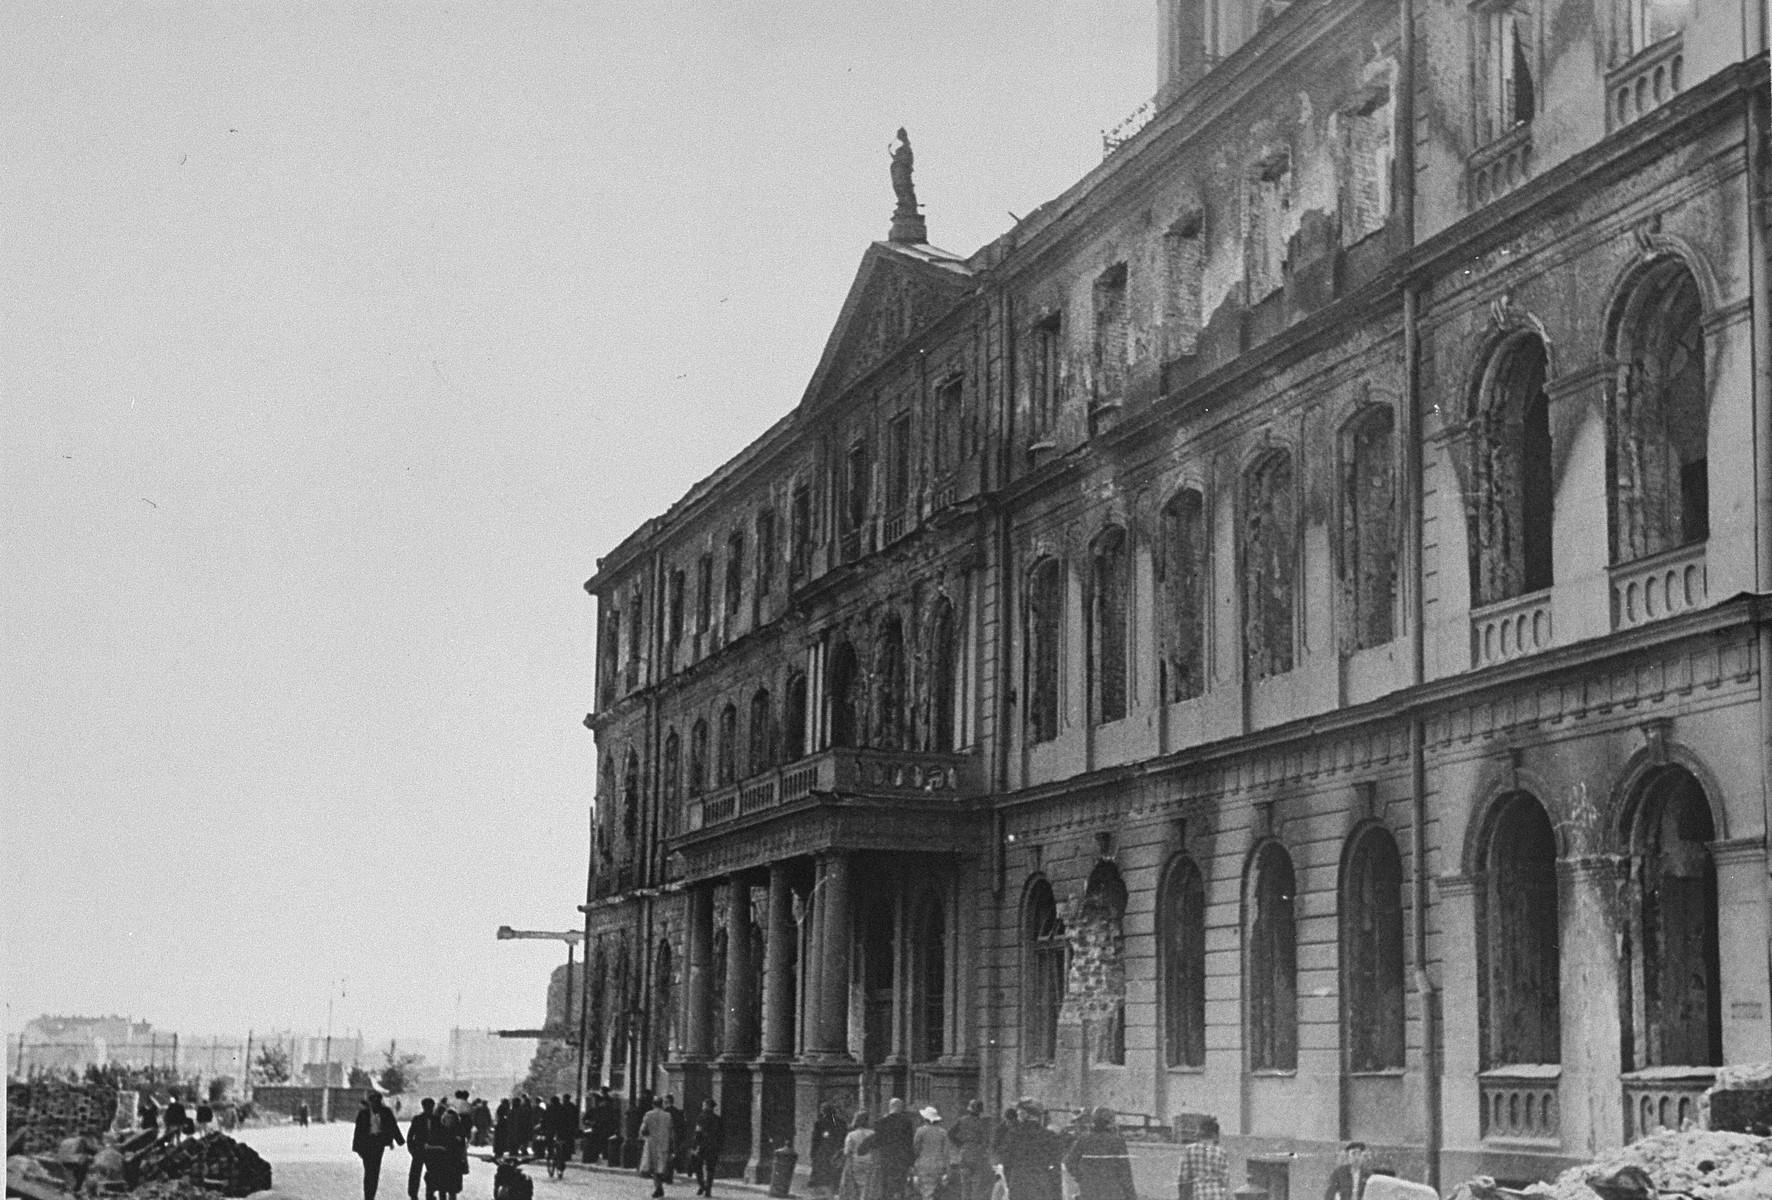 Latvian civilians walk past the Riga city hall, which was damaged in a German air raid.